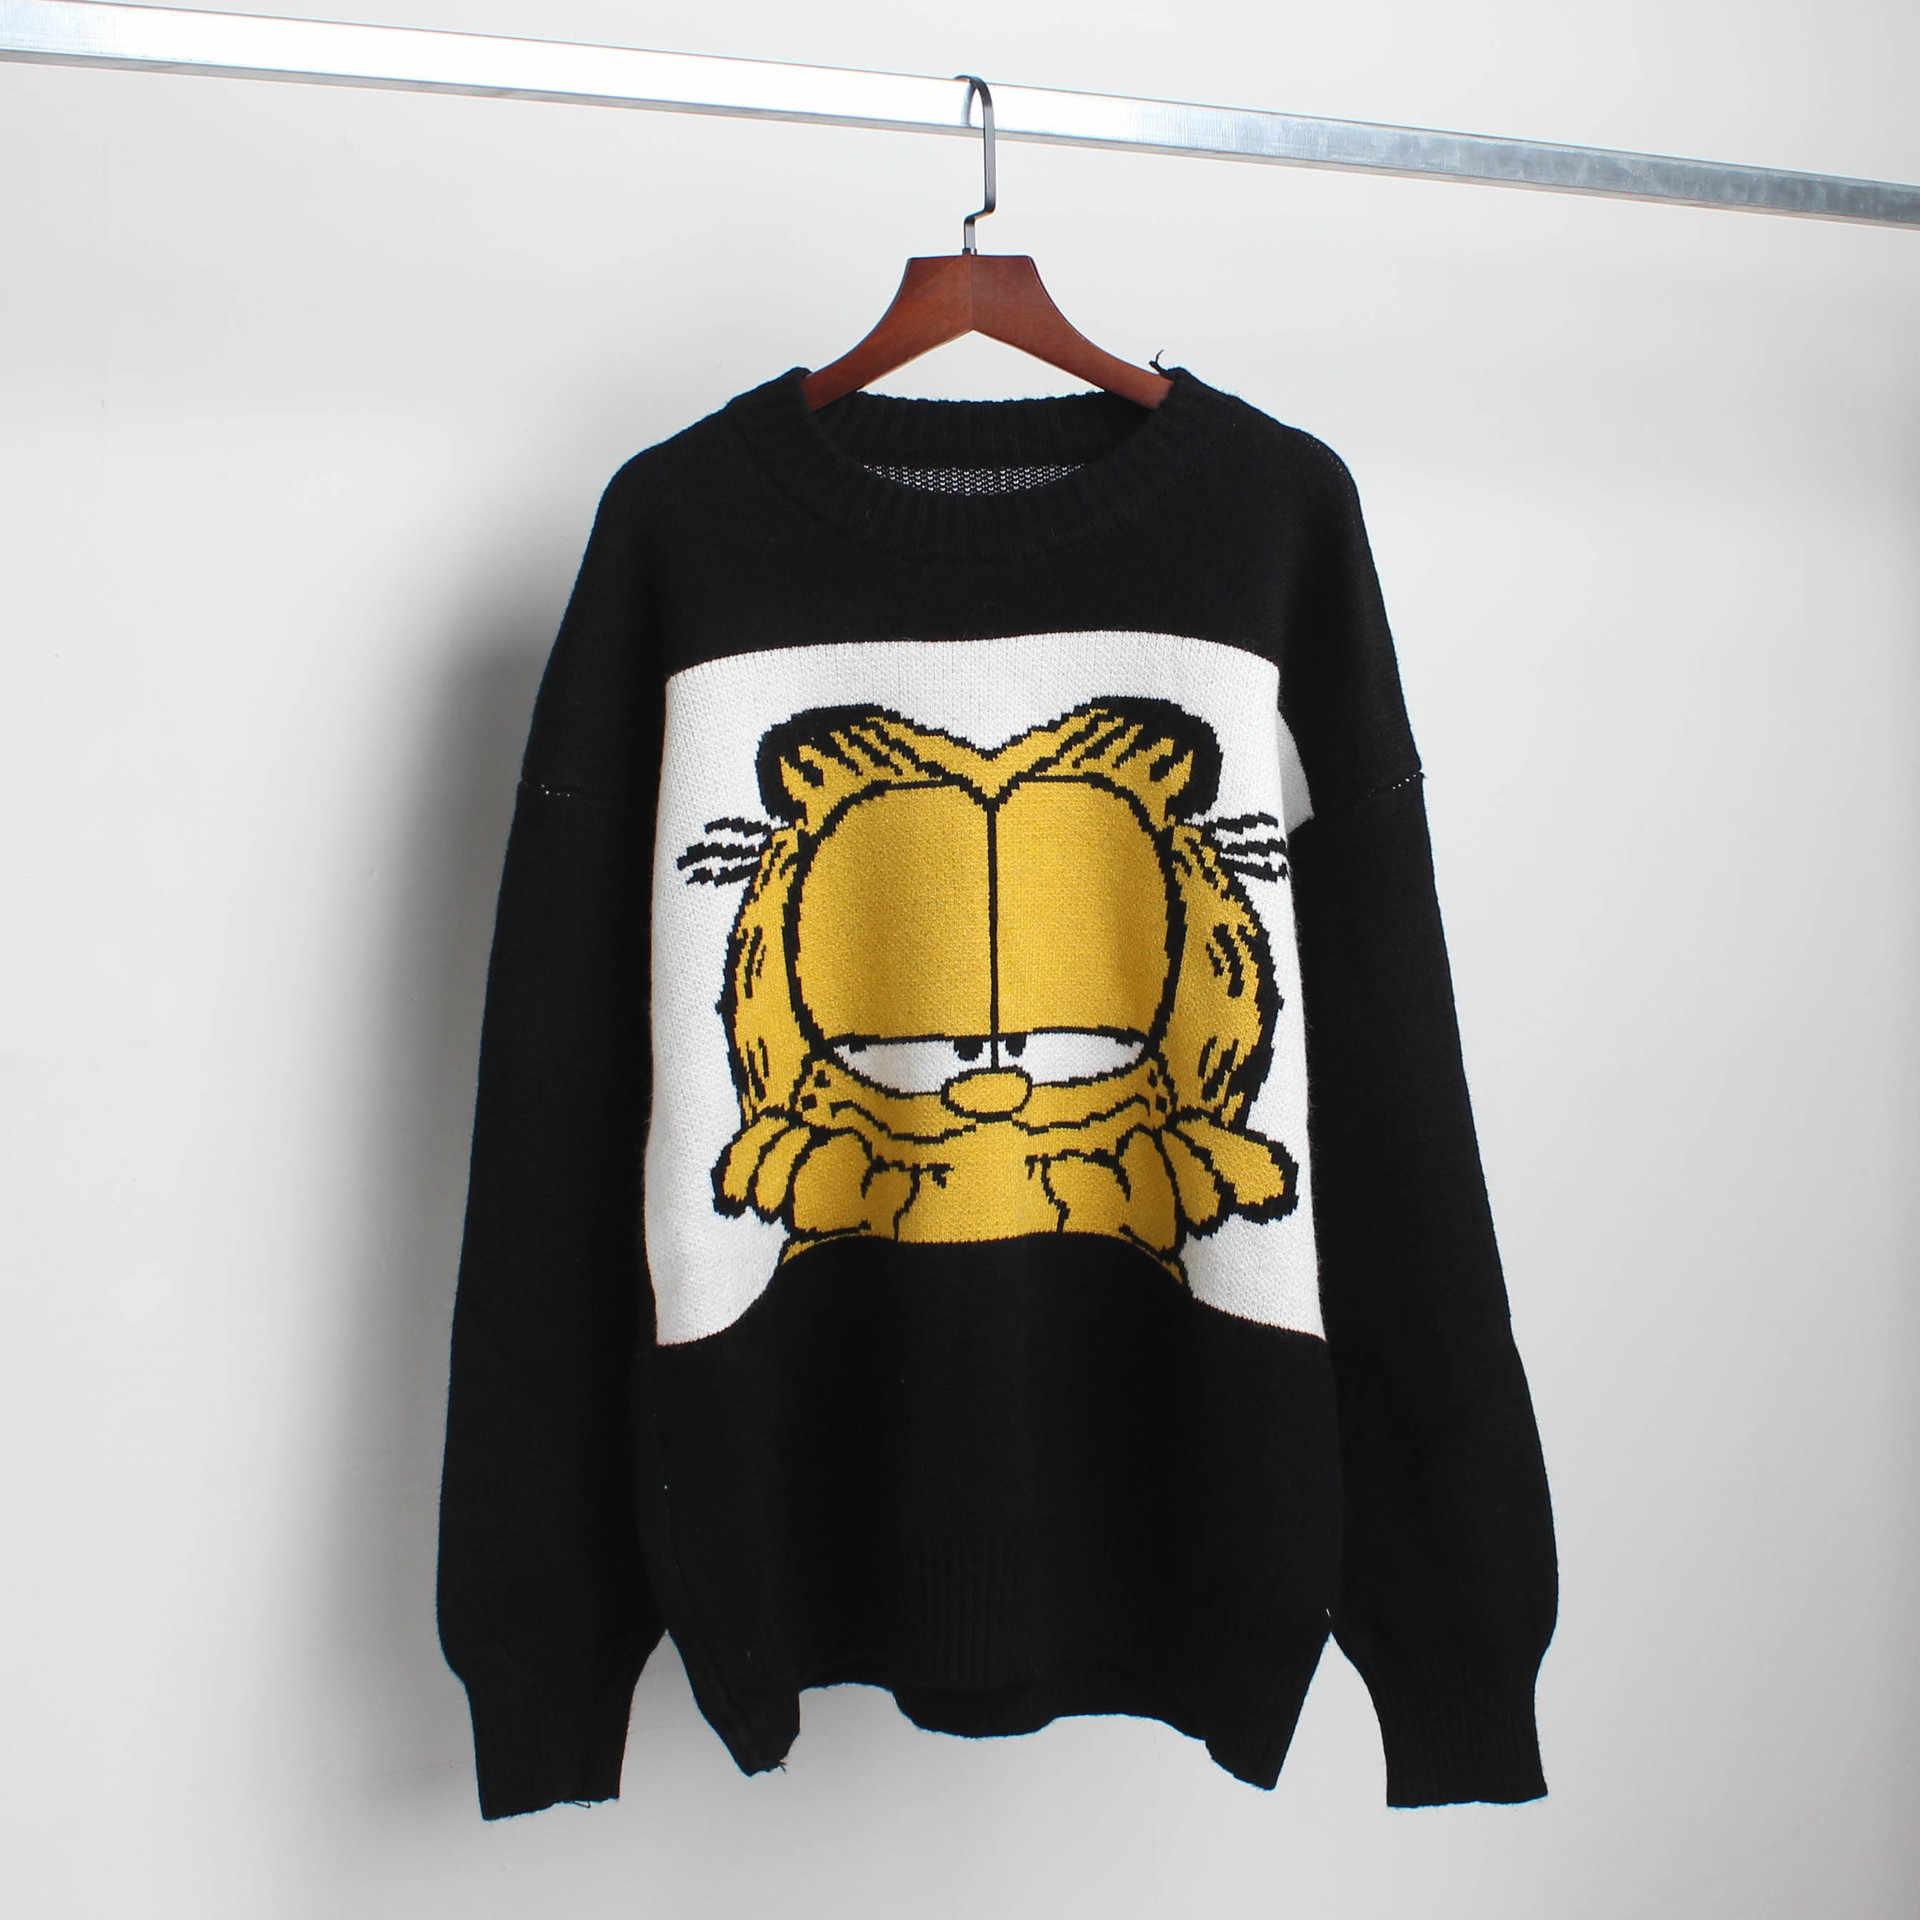 Baru Korea Gambar Kartun Garfield Wanita Sweater Kartun Lucu Longgar Sweater Musim Gugur Musim Dingin Fashion Gadis Pakaian Top